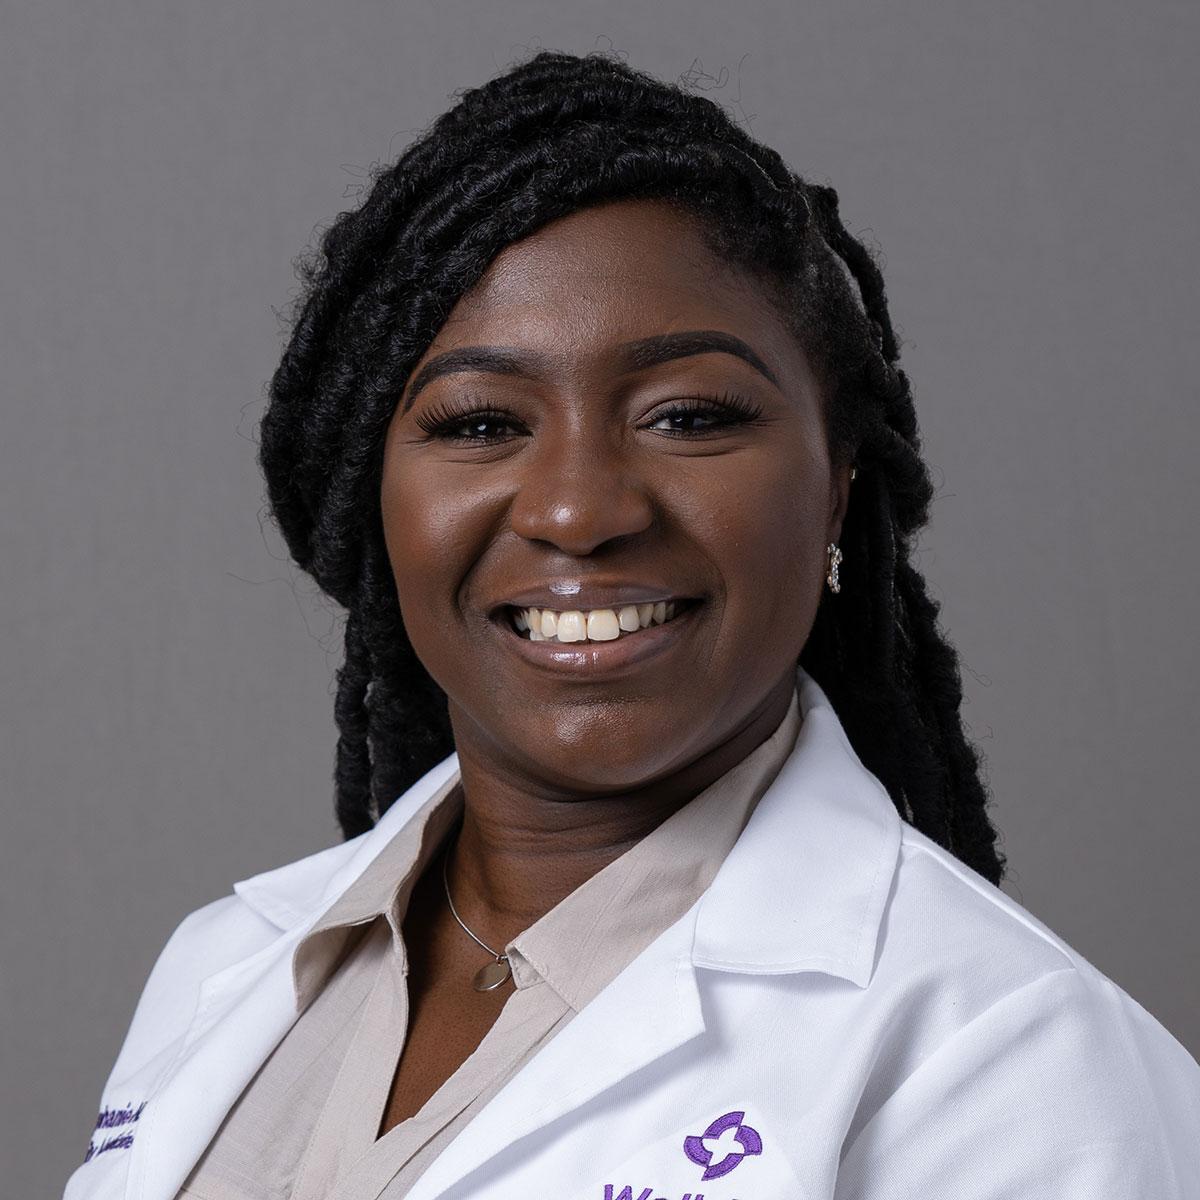 A friendly headshot of Dr. Stephanie Okeke